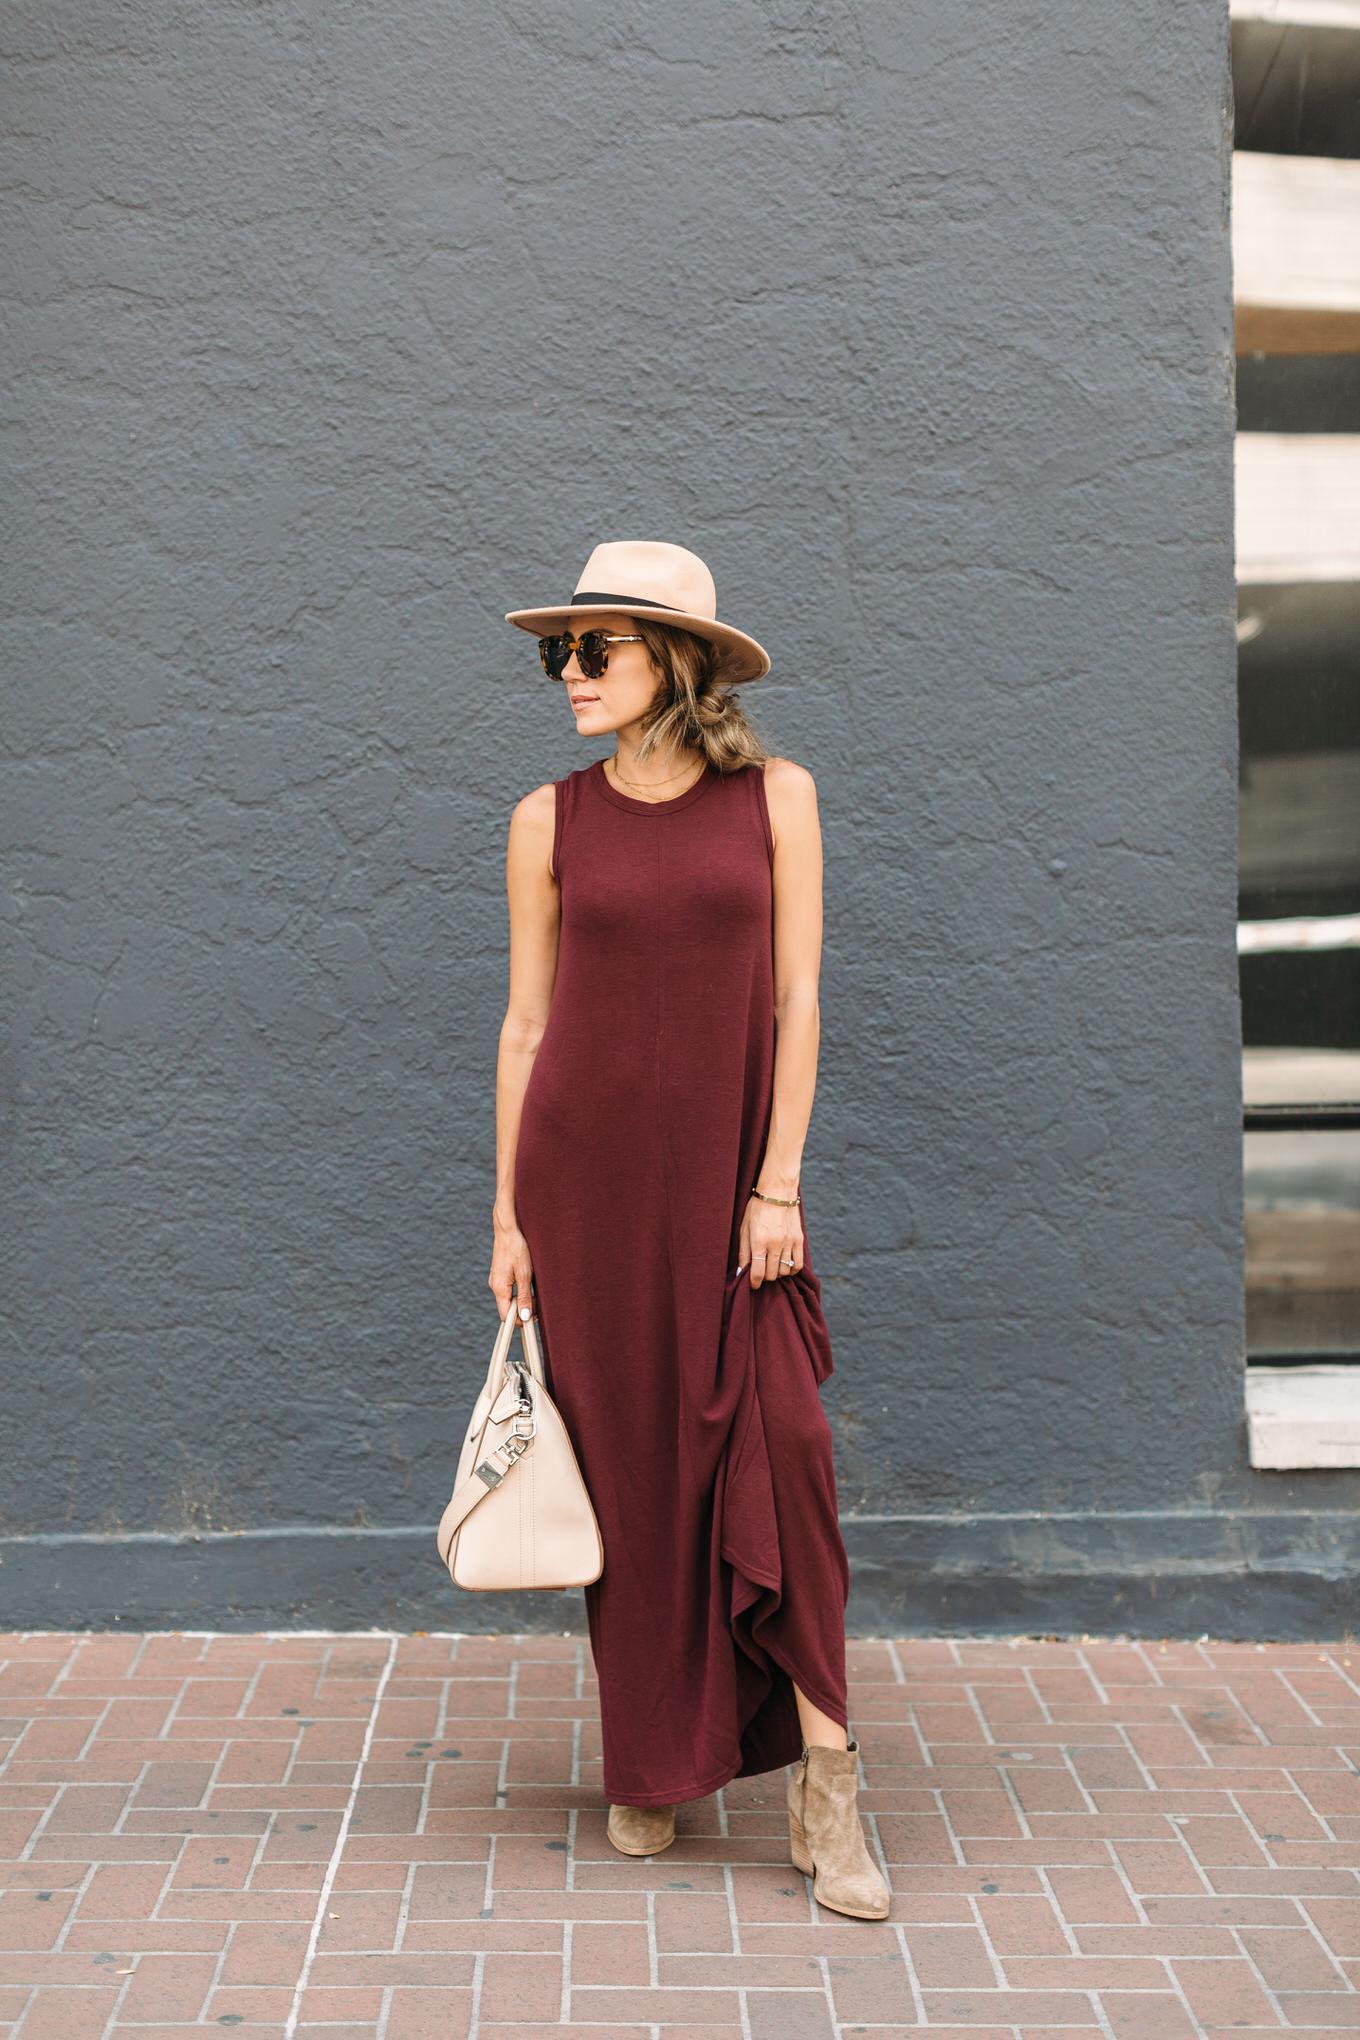 6 Comfortable Fall Outfits - Hello Fashion